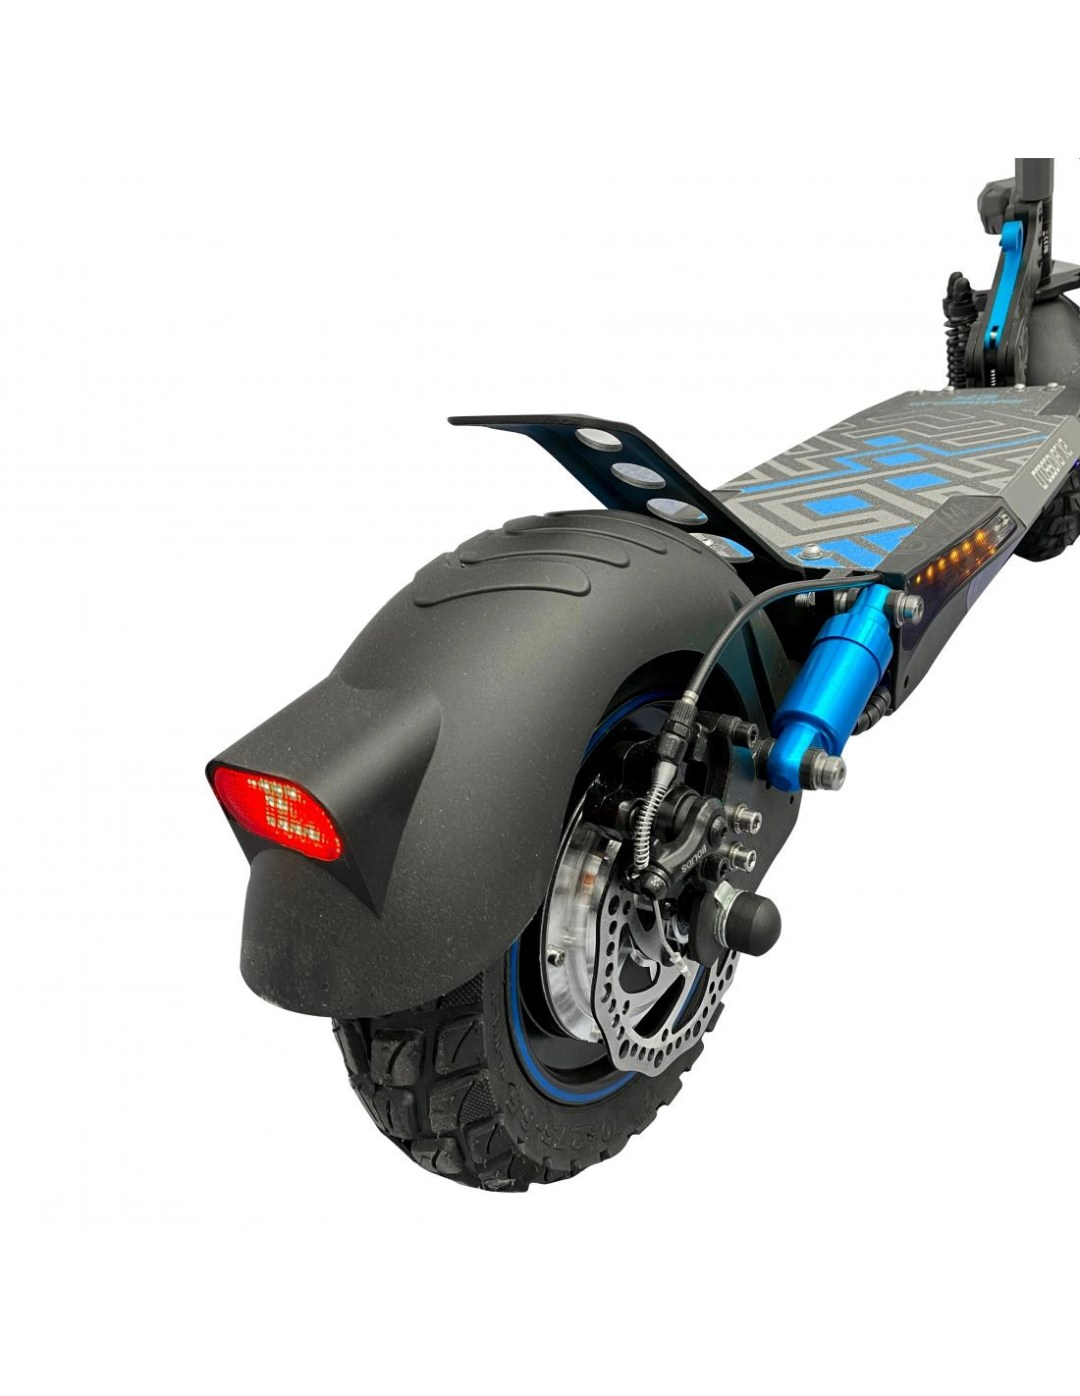 patinete electrico Smartgyro Crossover rueda